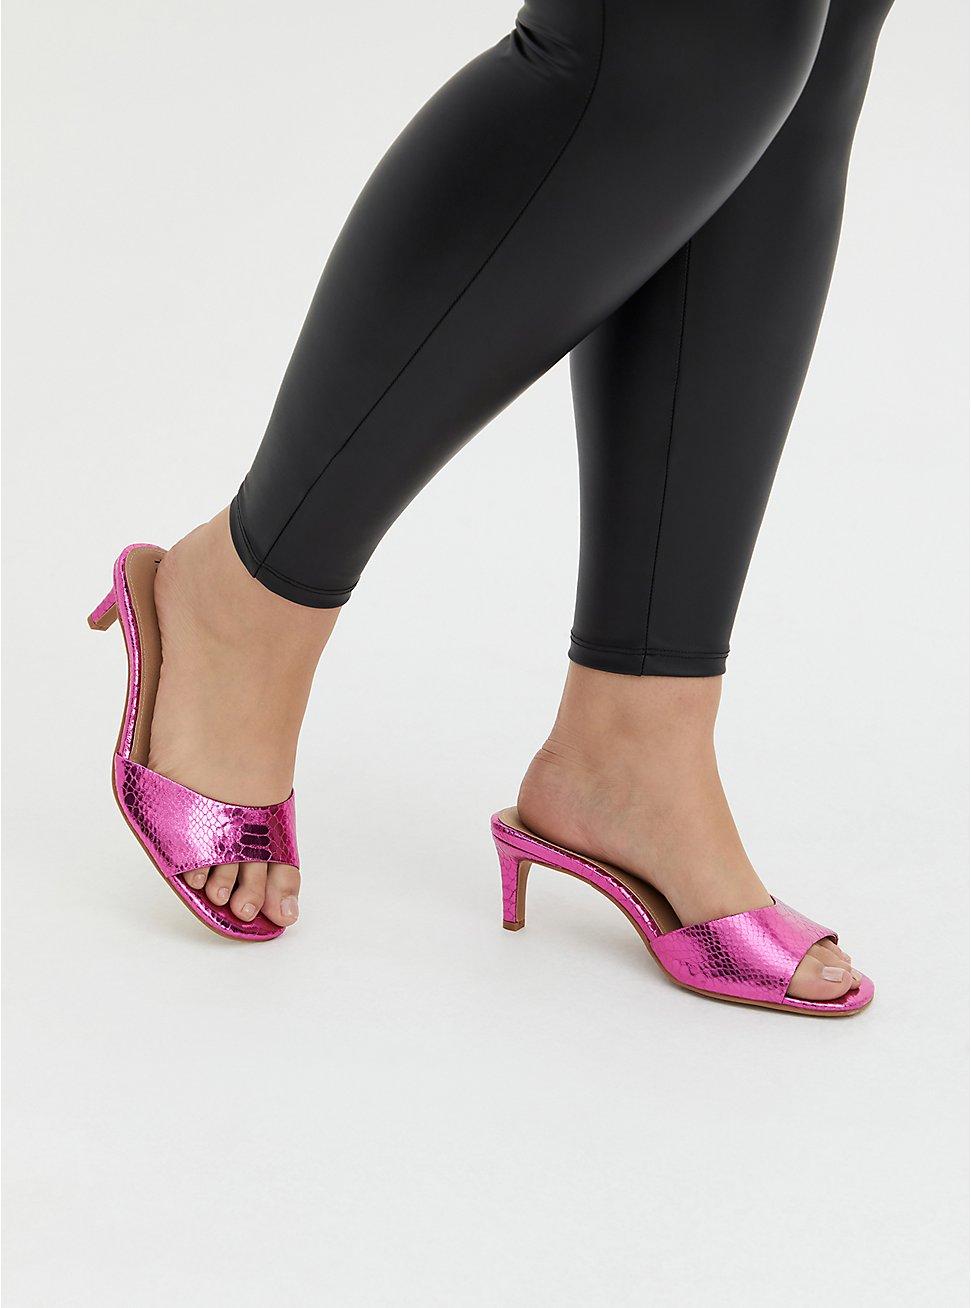 Plus Size Neon Pink Faux Leather Snakeskin Mule Heel (WW), NEON FUCHSIA, hi-res